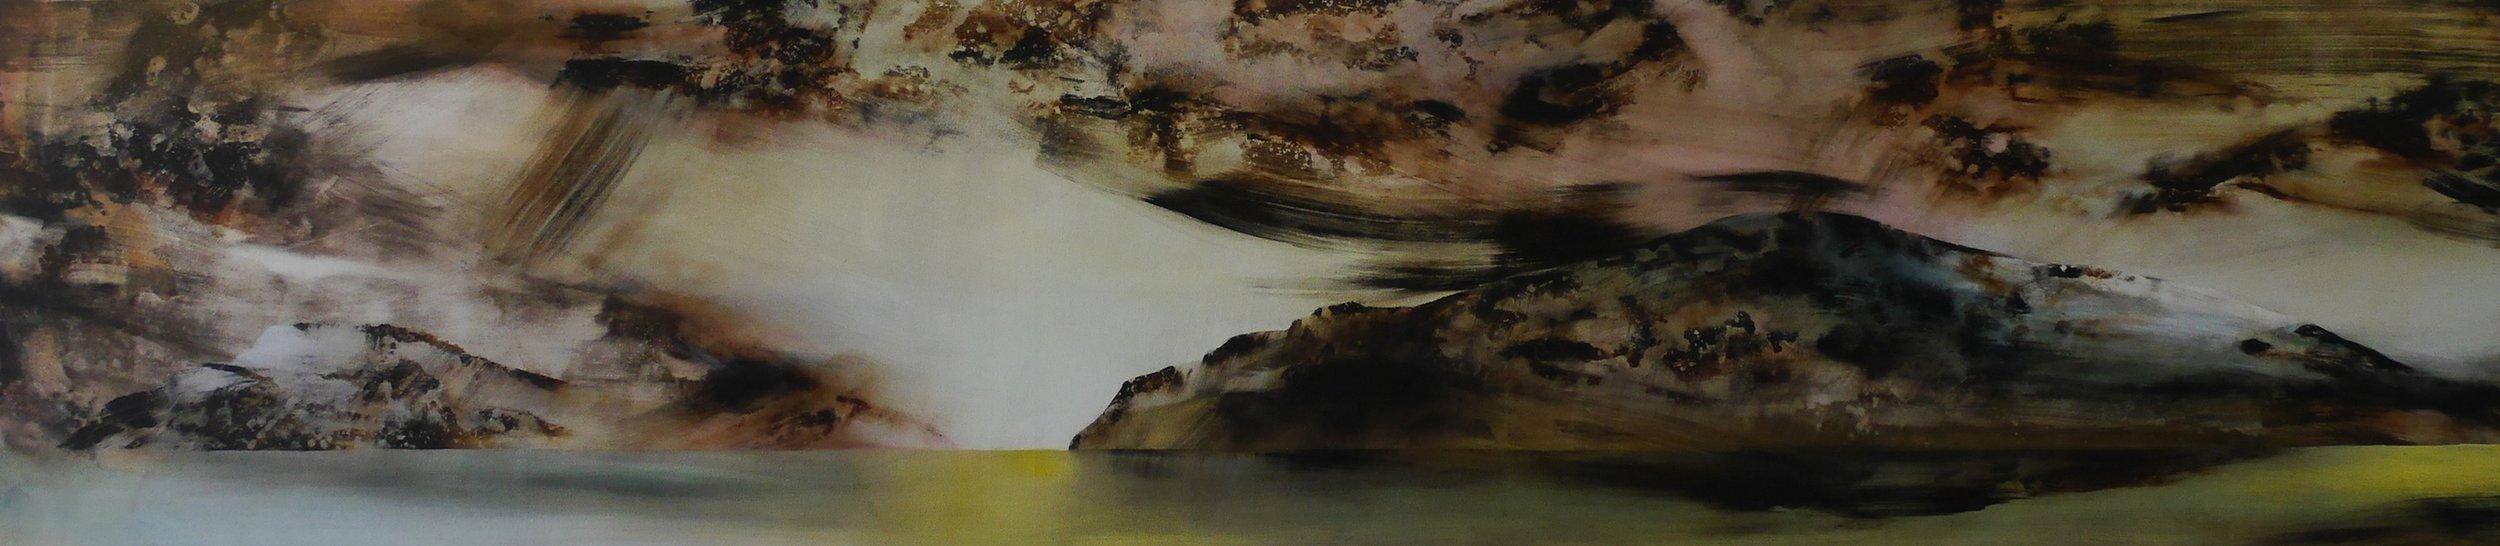 Wyn-Lyn TAN  In(visible) Horizons V  2017 Acrylic on canvas H54 x W245 x D2 cm